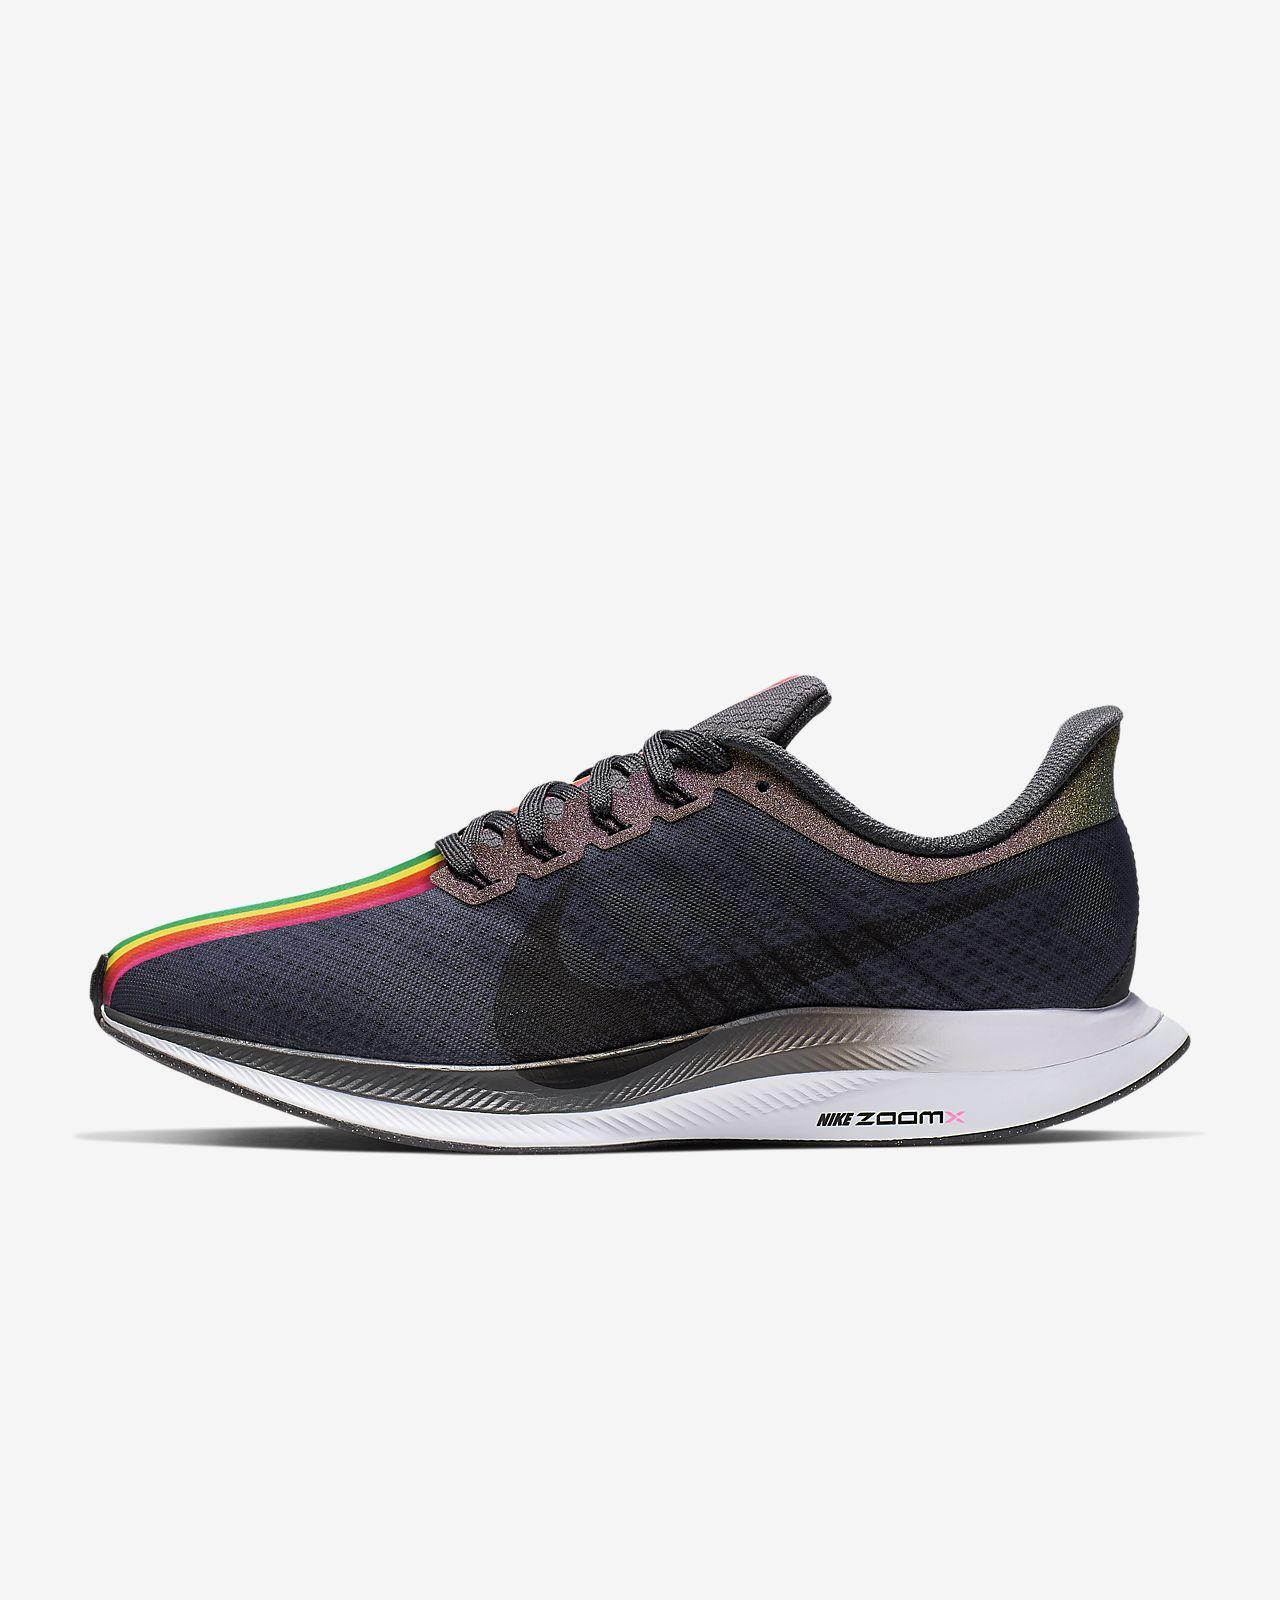 Nike Zoom Pegasus Turbo Shoe